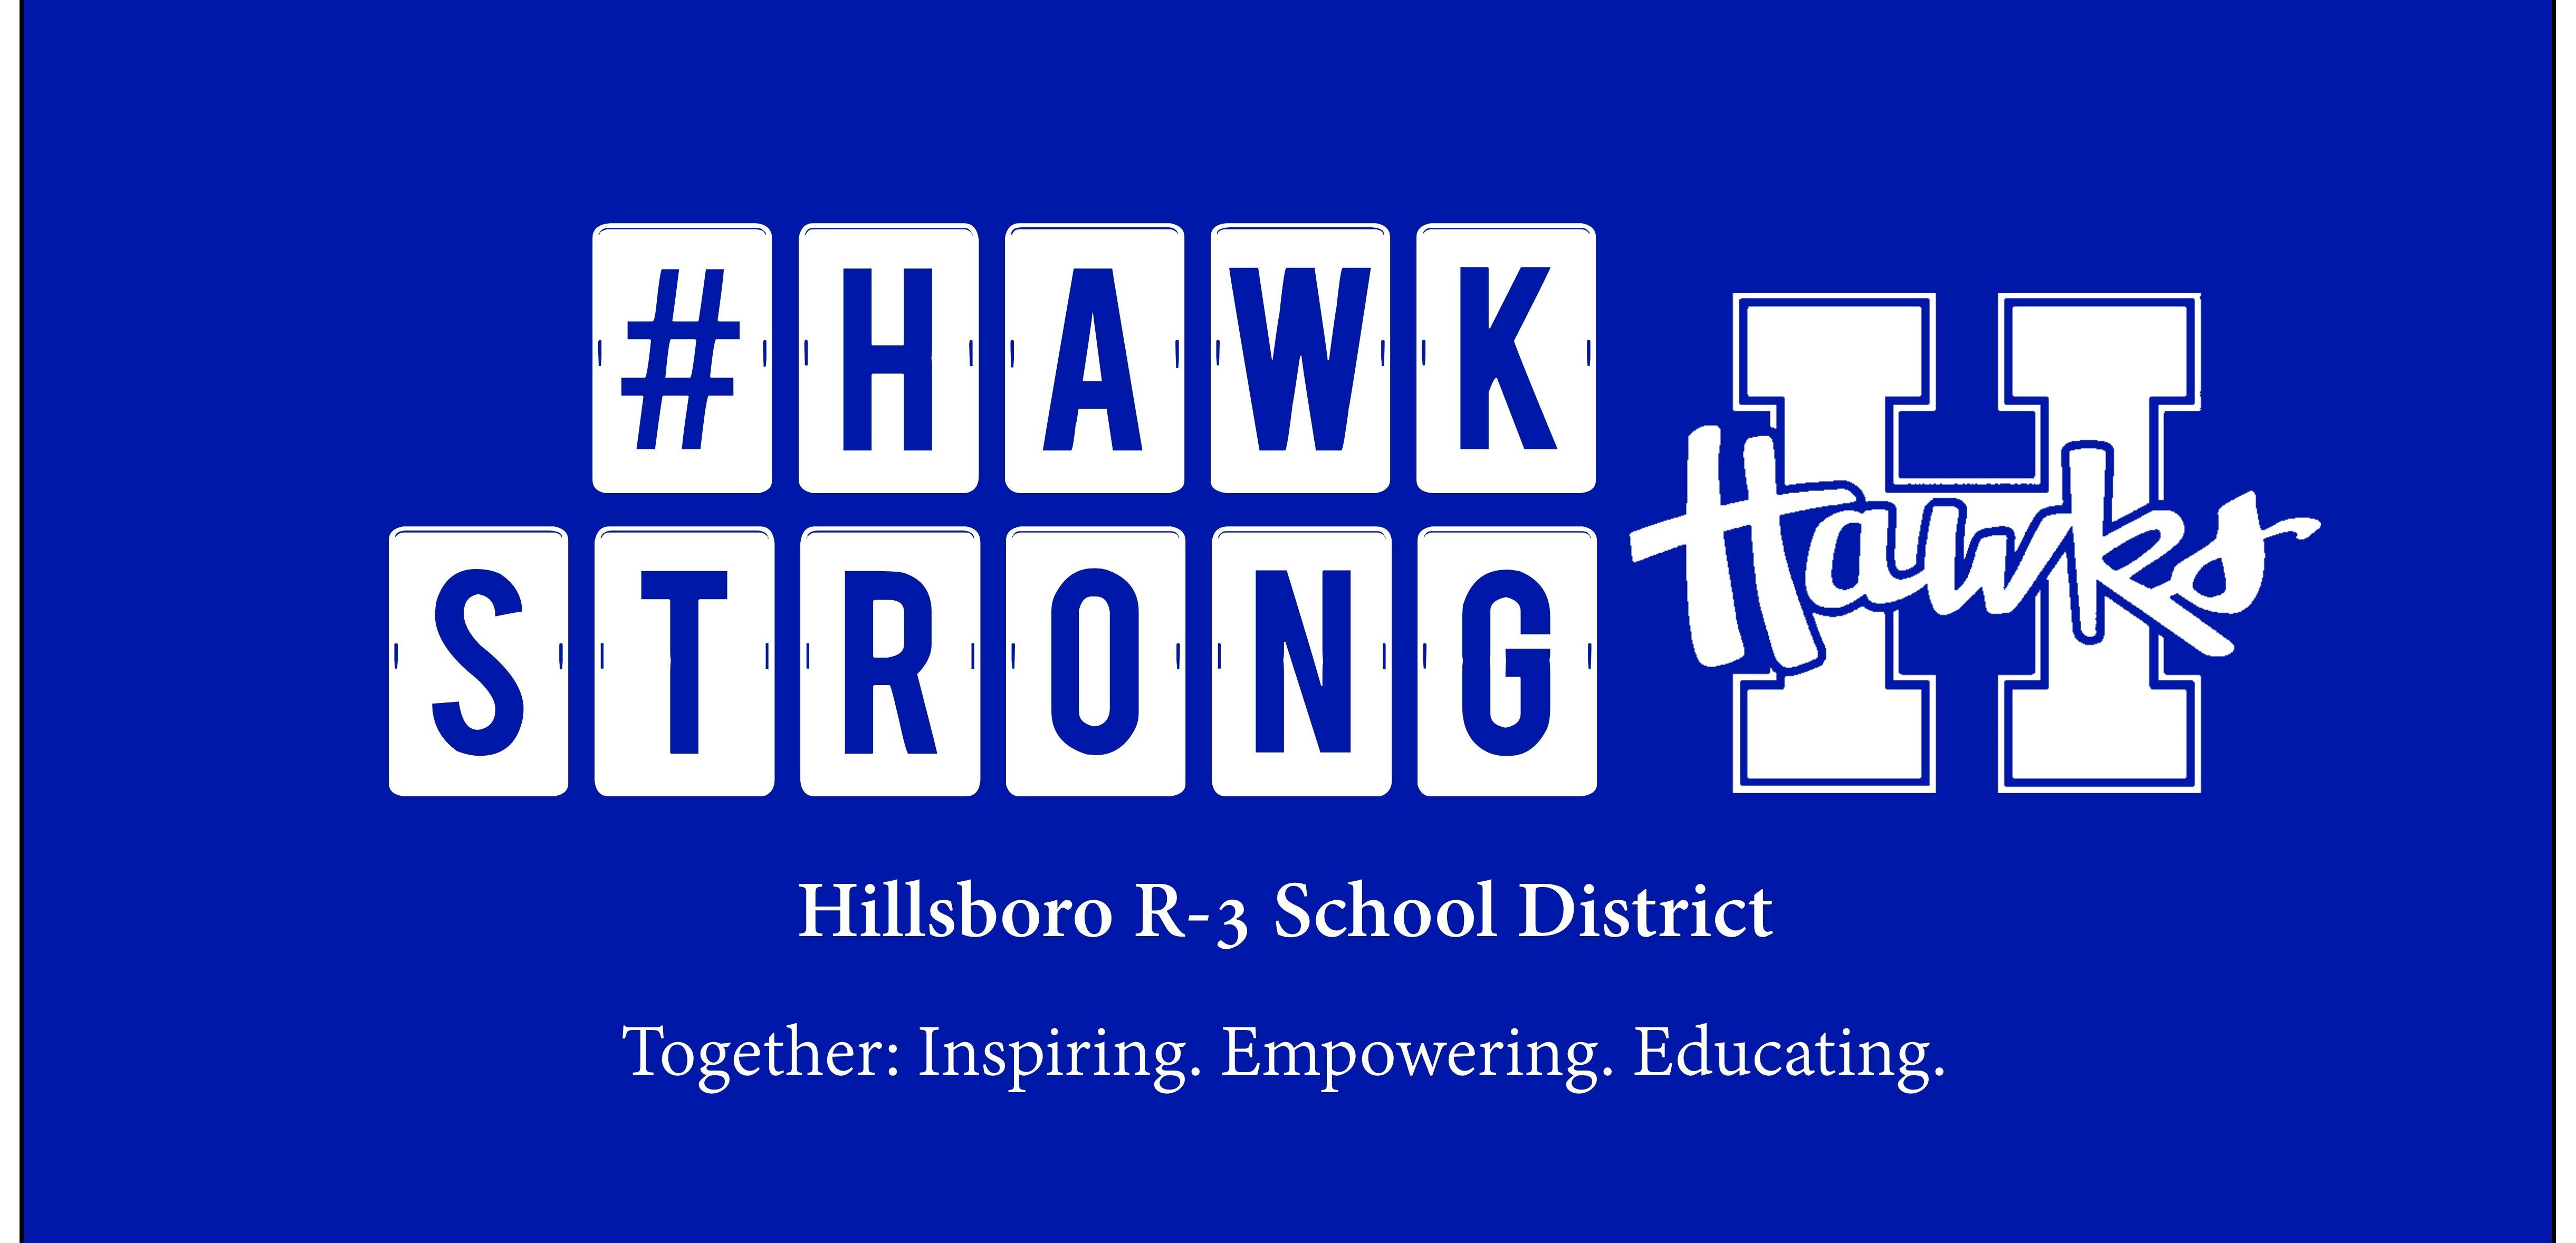 HawkStrong